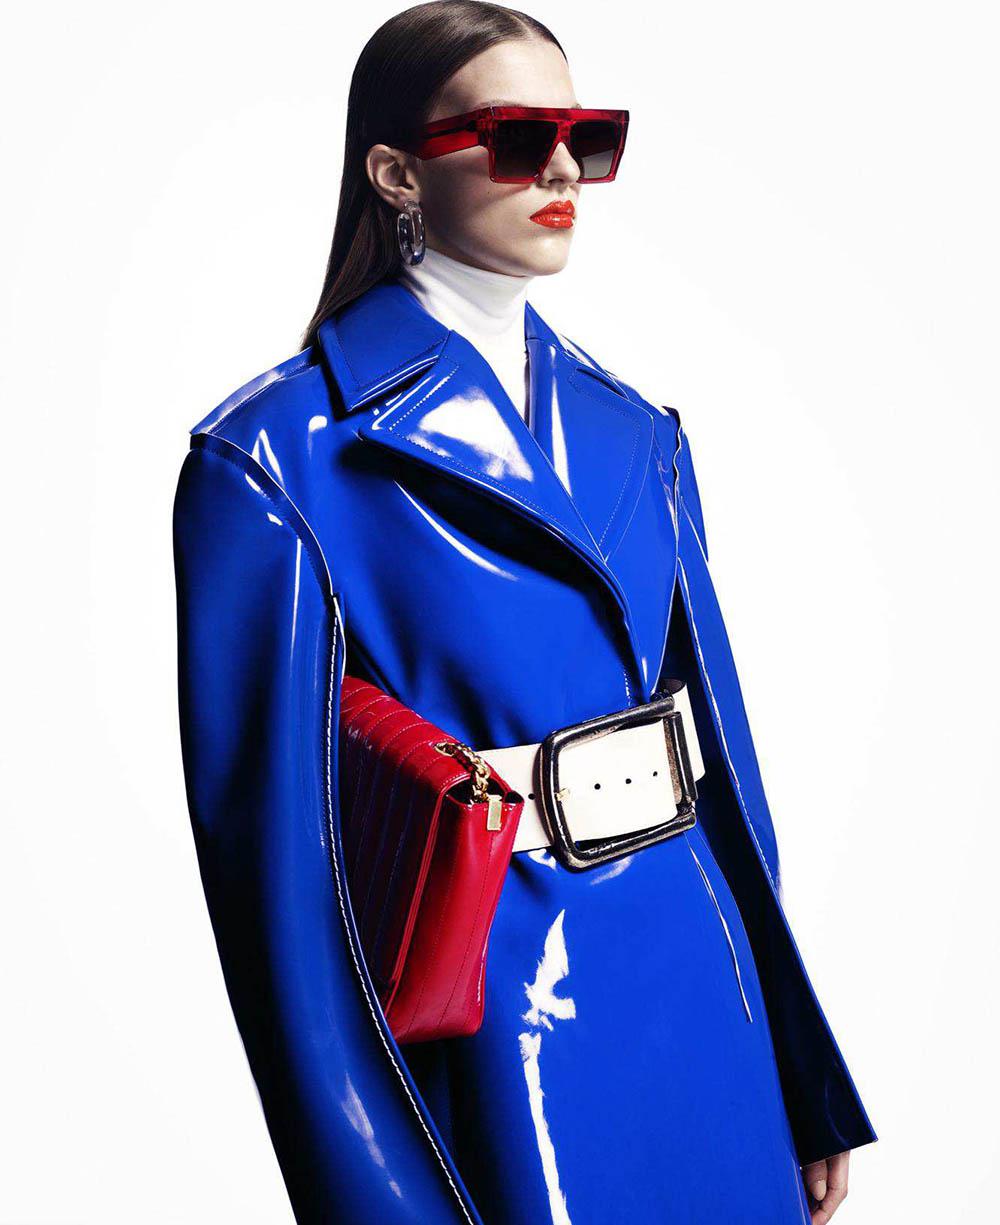 Silke van Daal by Yulia Gorbachenko for Harper's Bazaar US September 2018